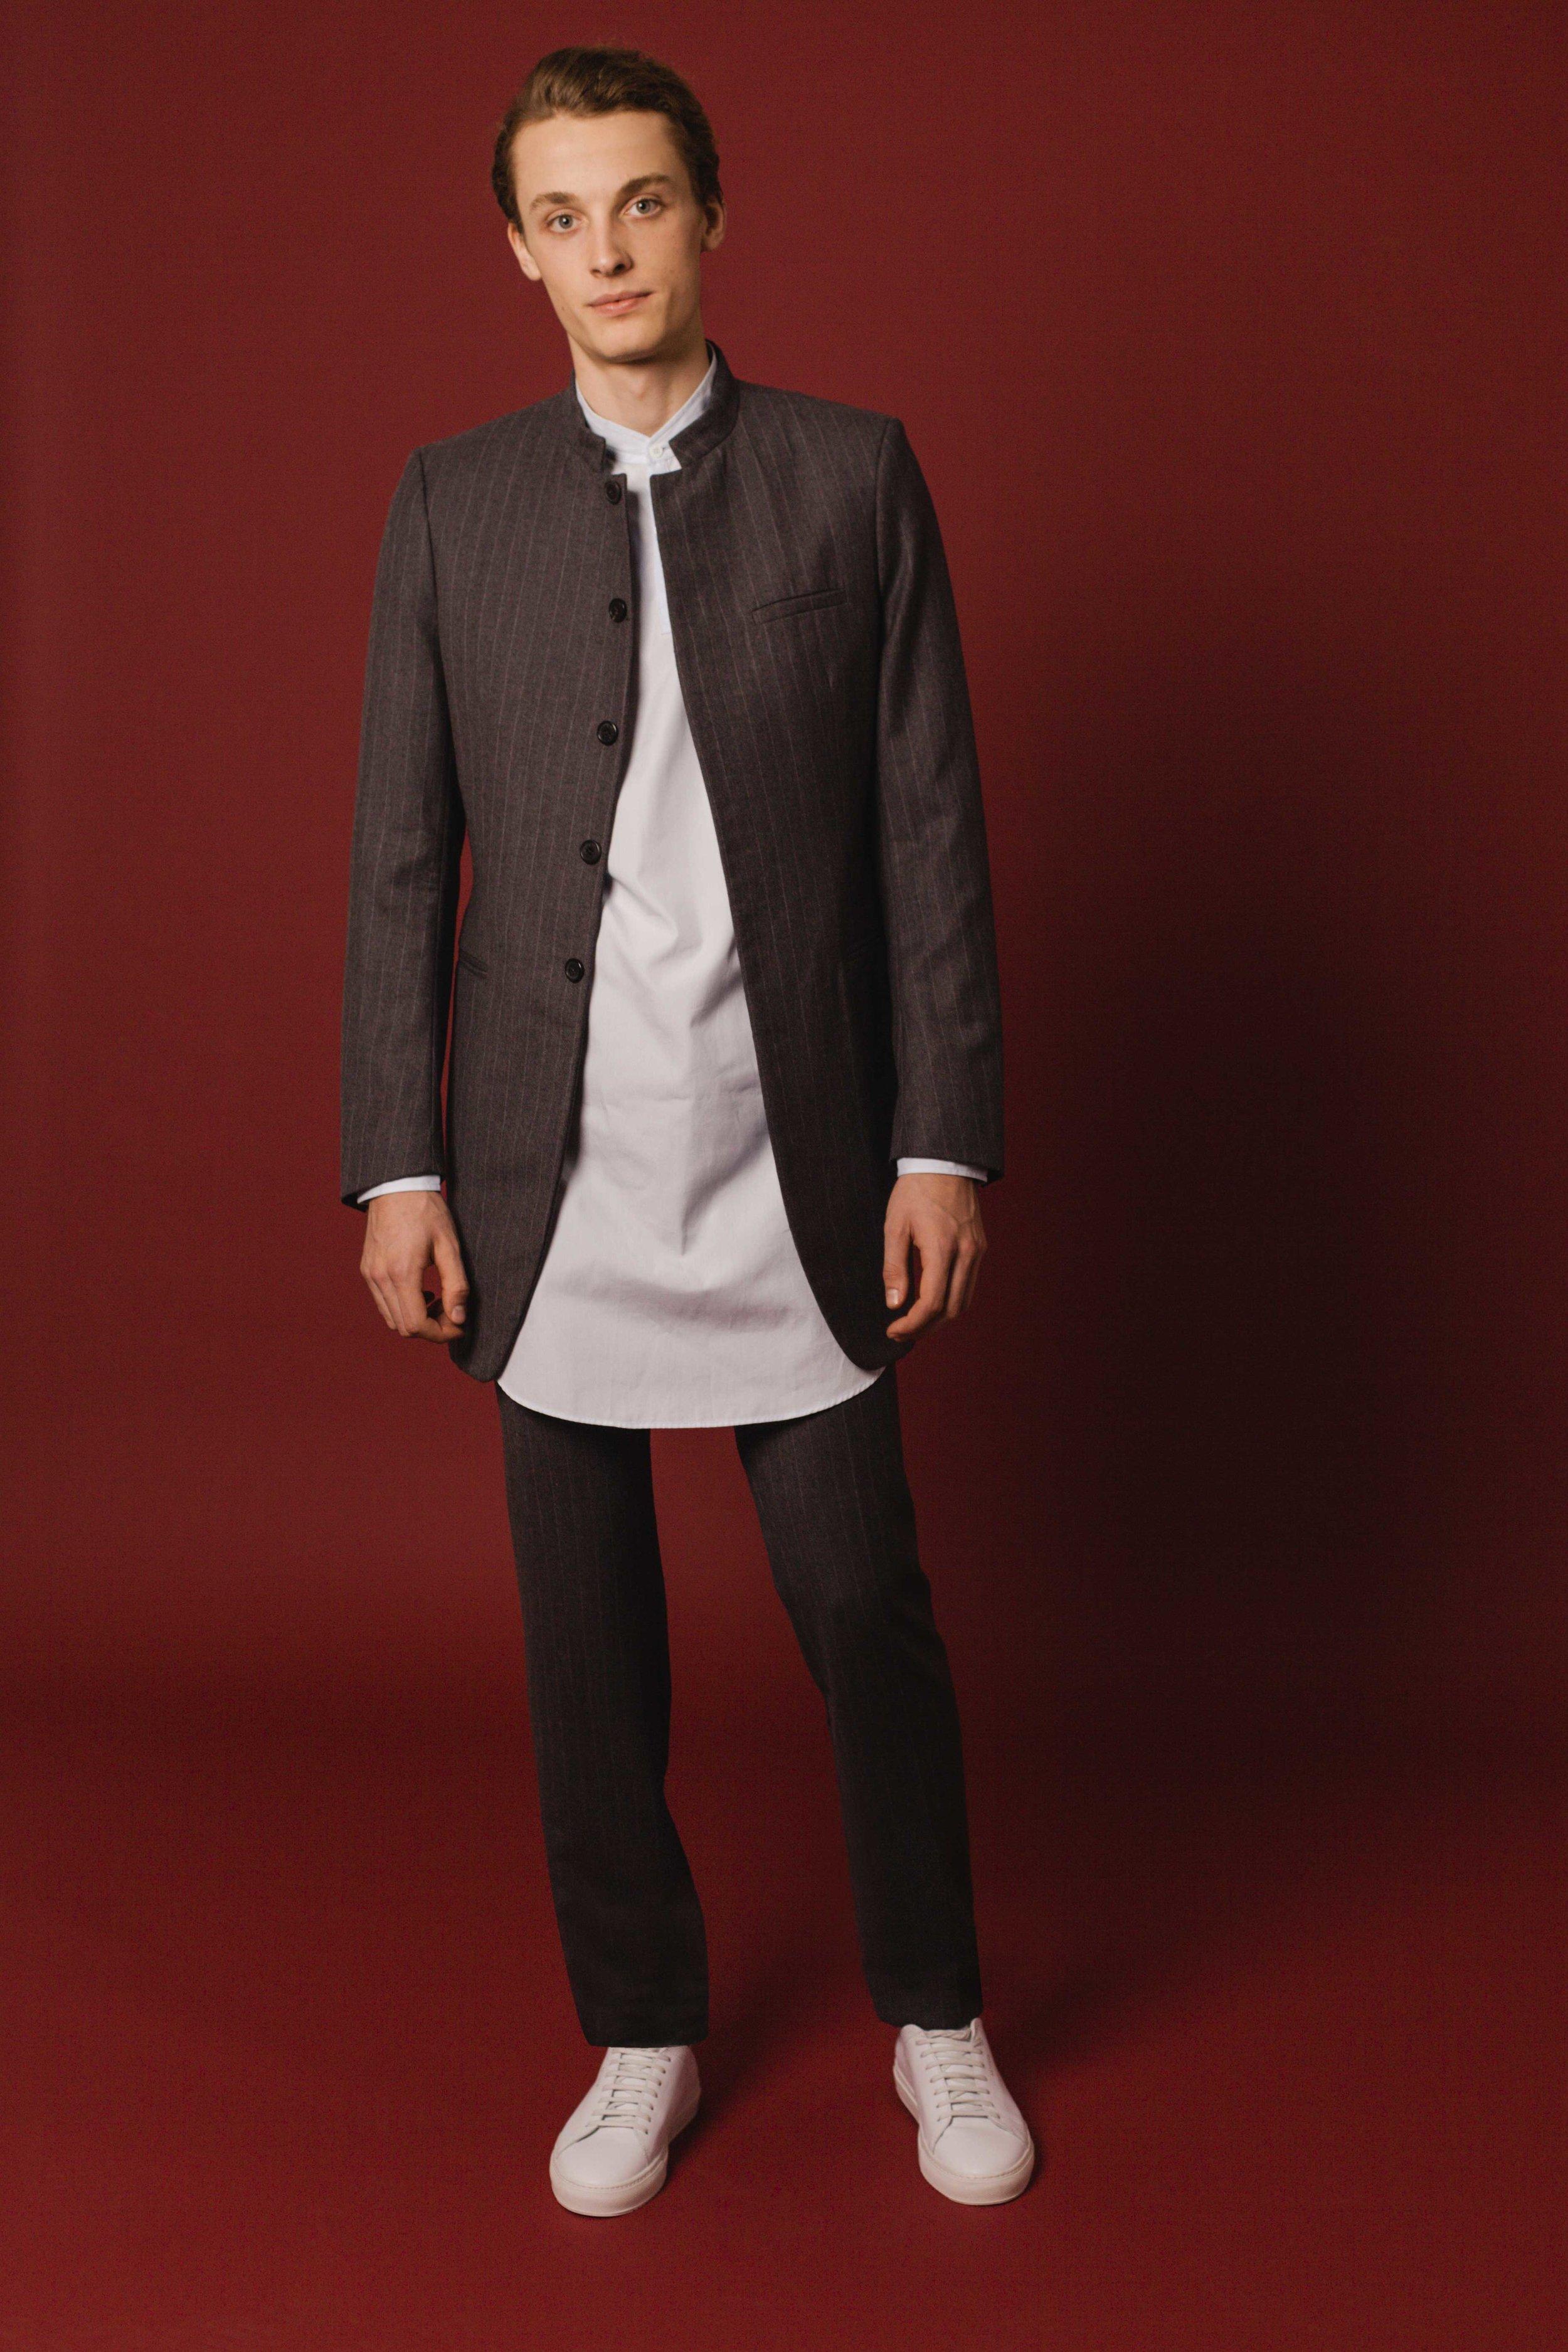 Bombay jacket long grey pinstripe wool Slim fit trousers grey pinstripe wool Made in England  Contemporary shirt long sky blue cotton Made in Italy